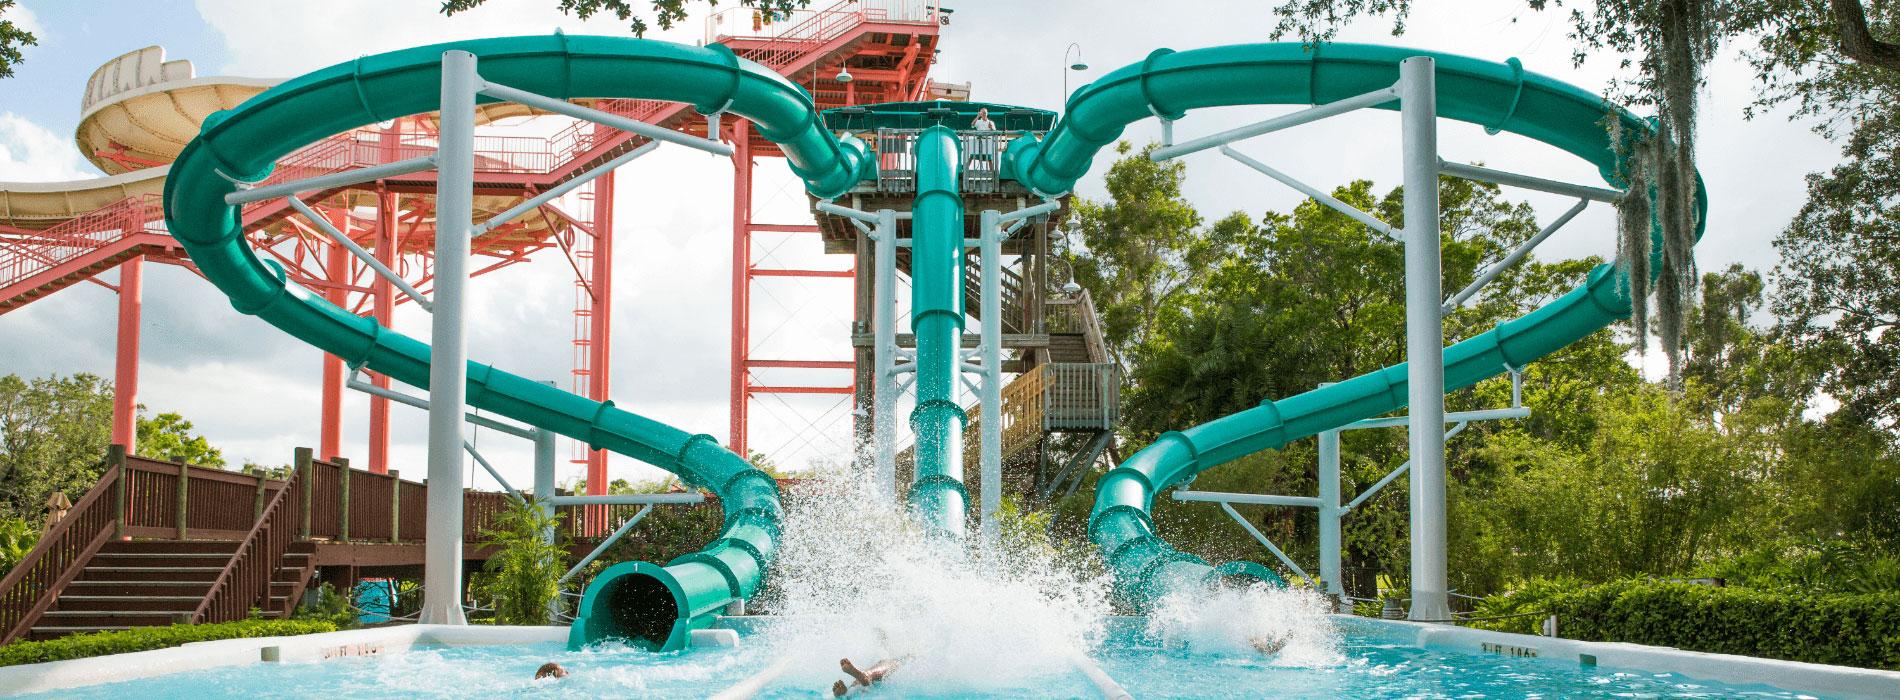 Water Moccosan Water Slide